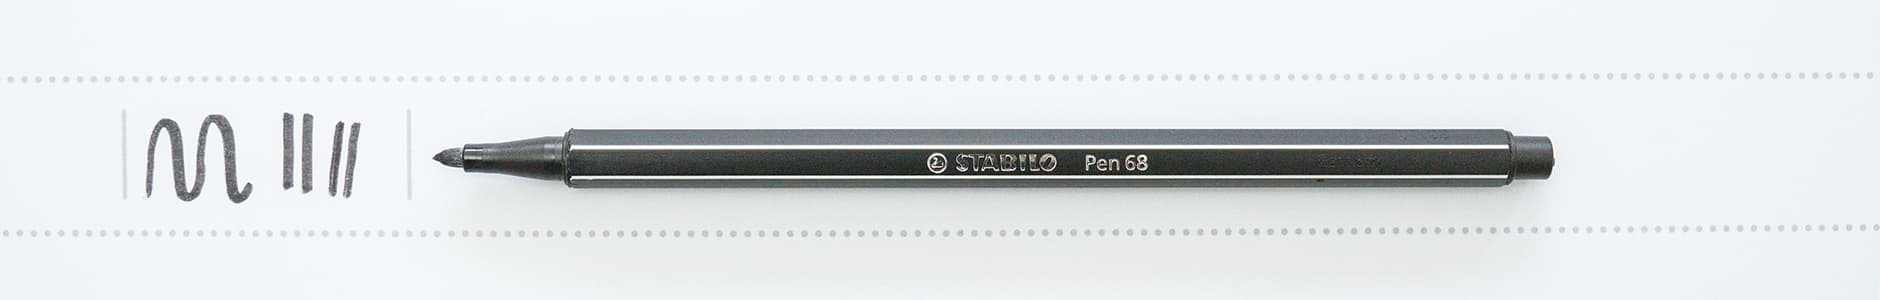 Stabilo Pen 68 schwarz